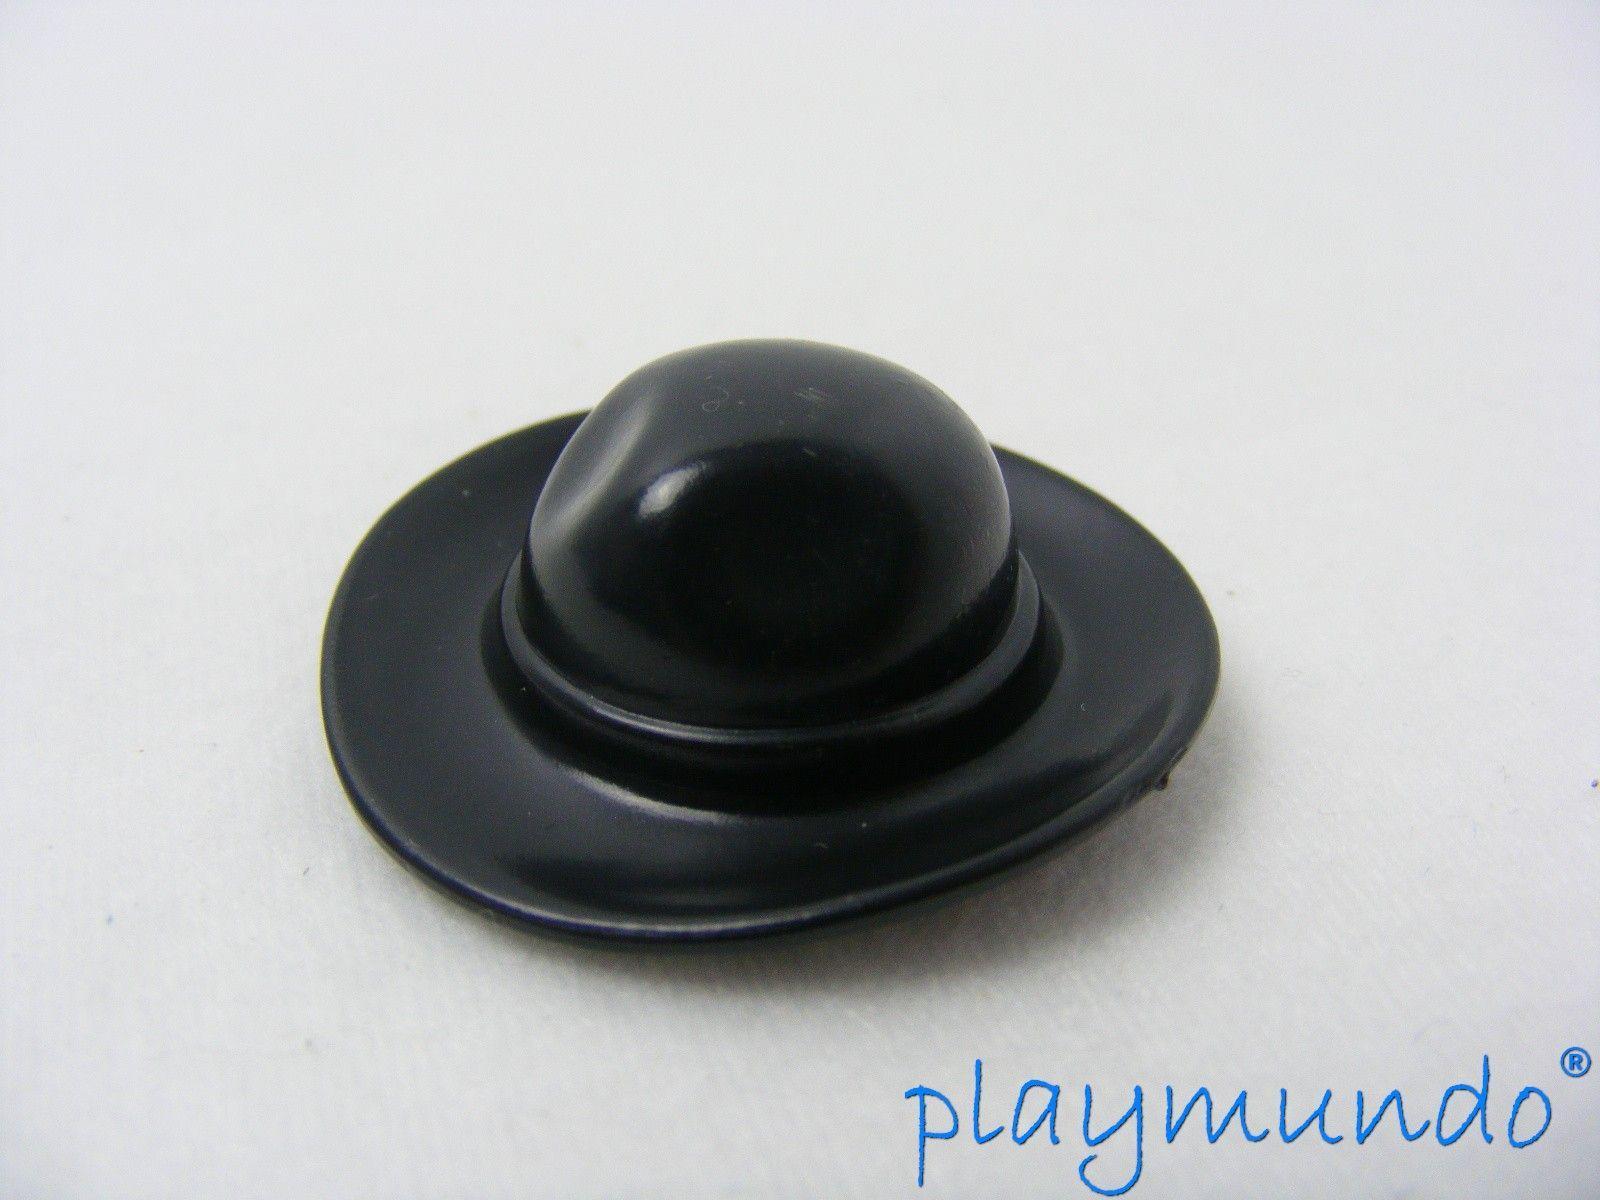 PLAYMOBIL SOMBRERO OESTE WESTERN MOD018